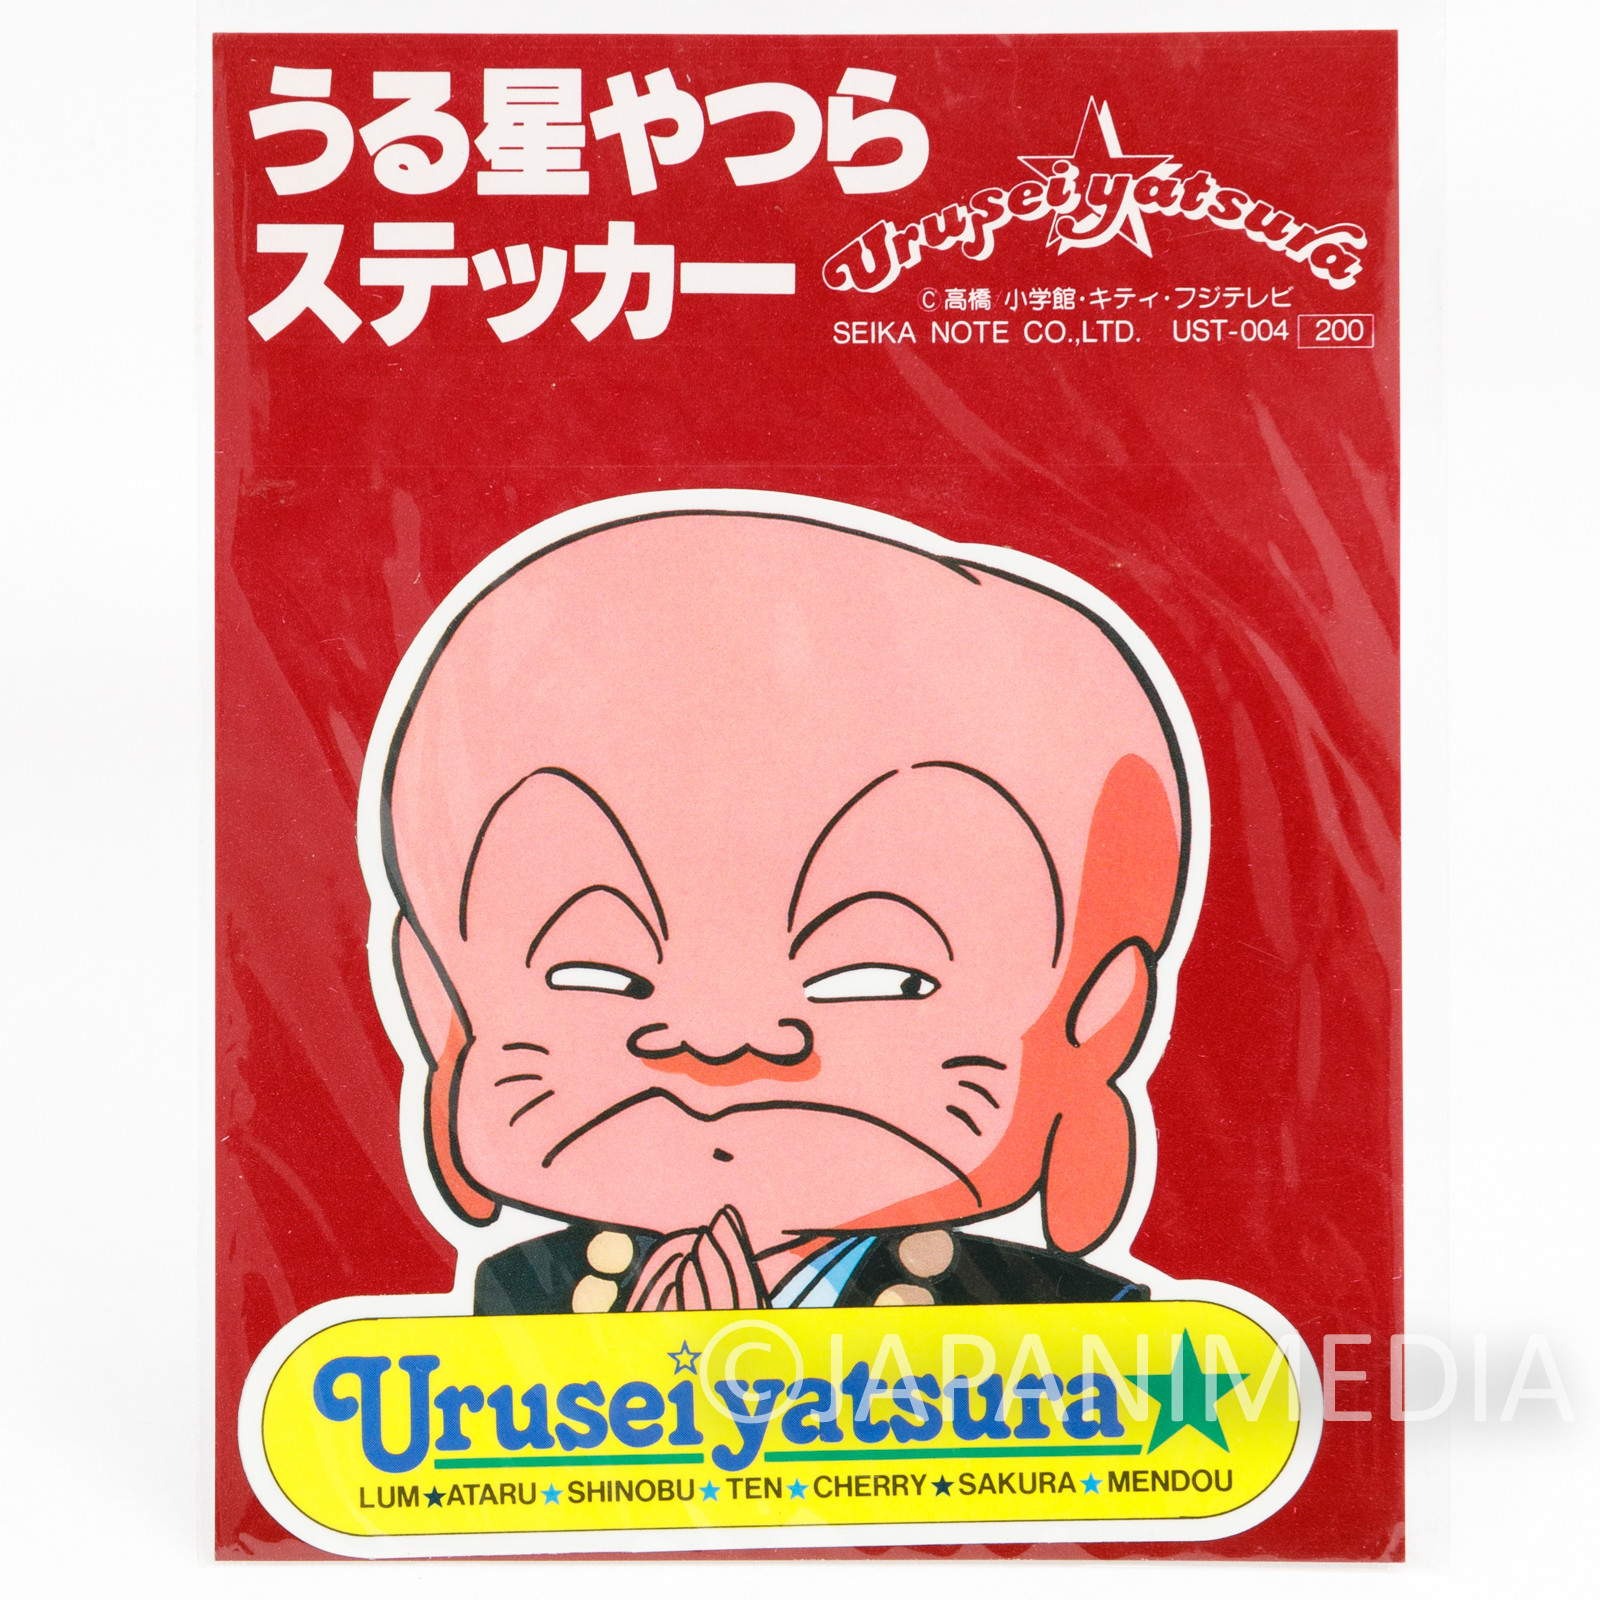 Retro Urusei Yatsura Sticker CHERRY Sakuranbou JAPAN ANIME SEIKA NOTE